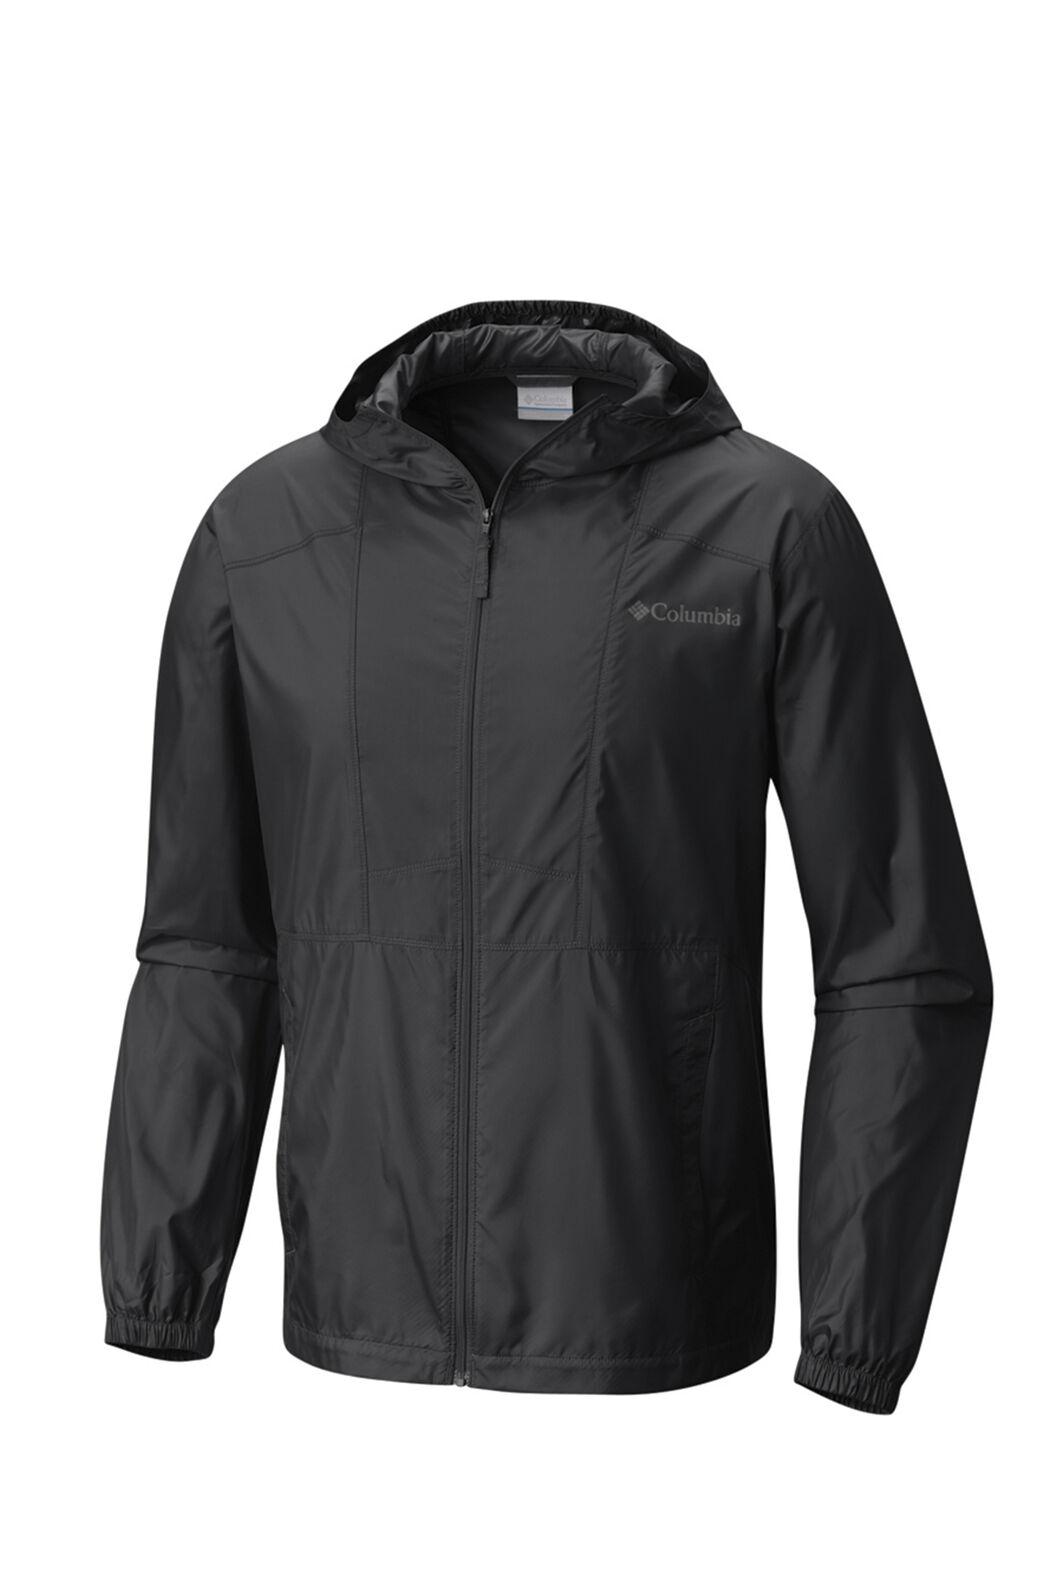 Columbia Men's Flashback Windbreaker Jacket, Black, hi-res